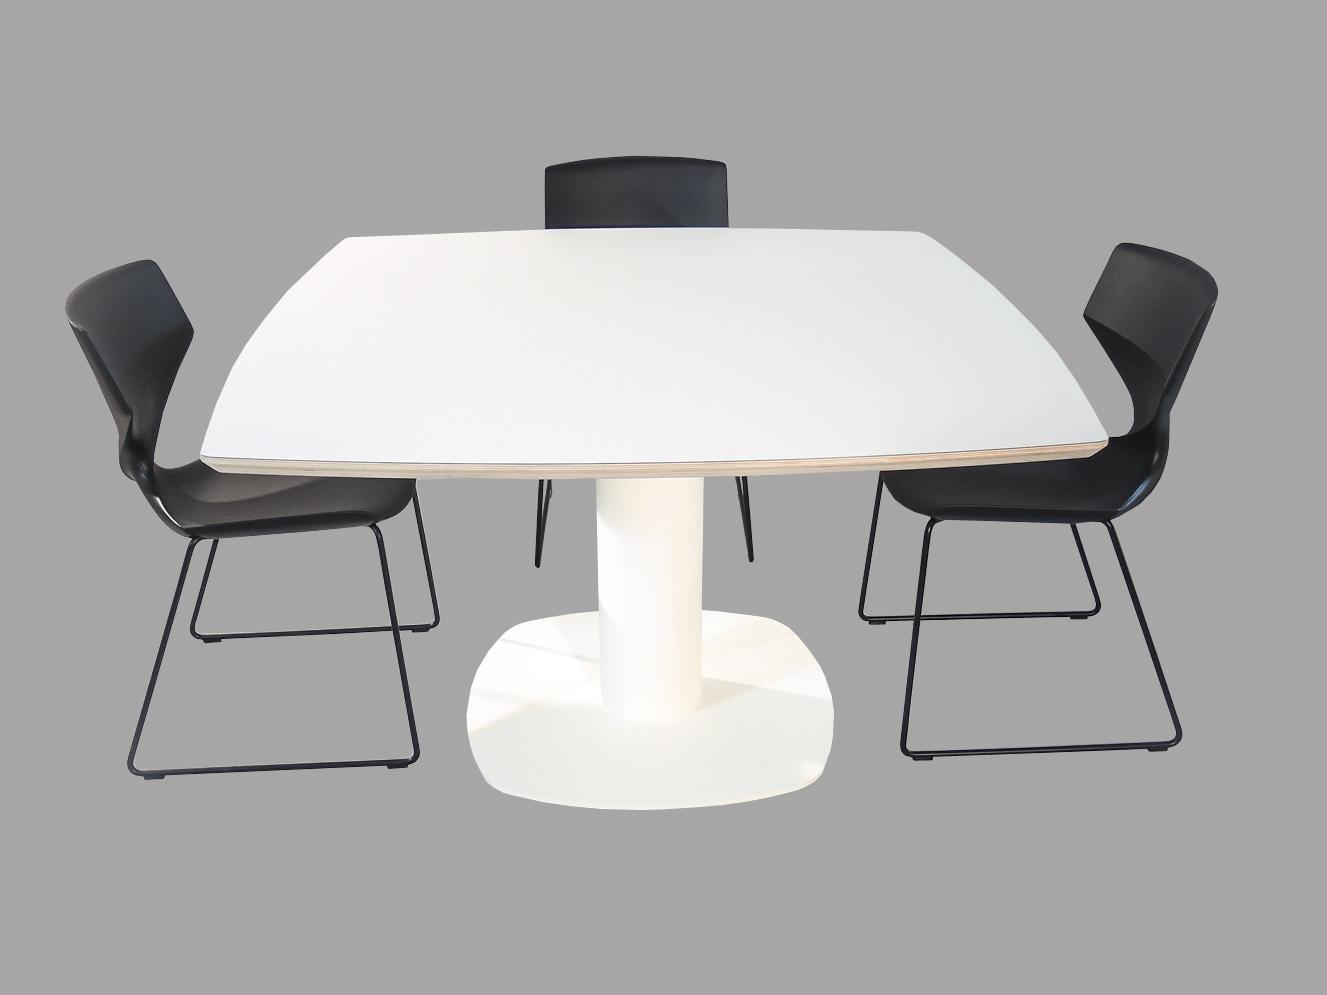 Witte Vierkante Eettafel.Empoli Design Fenix Witte Eettafel